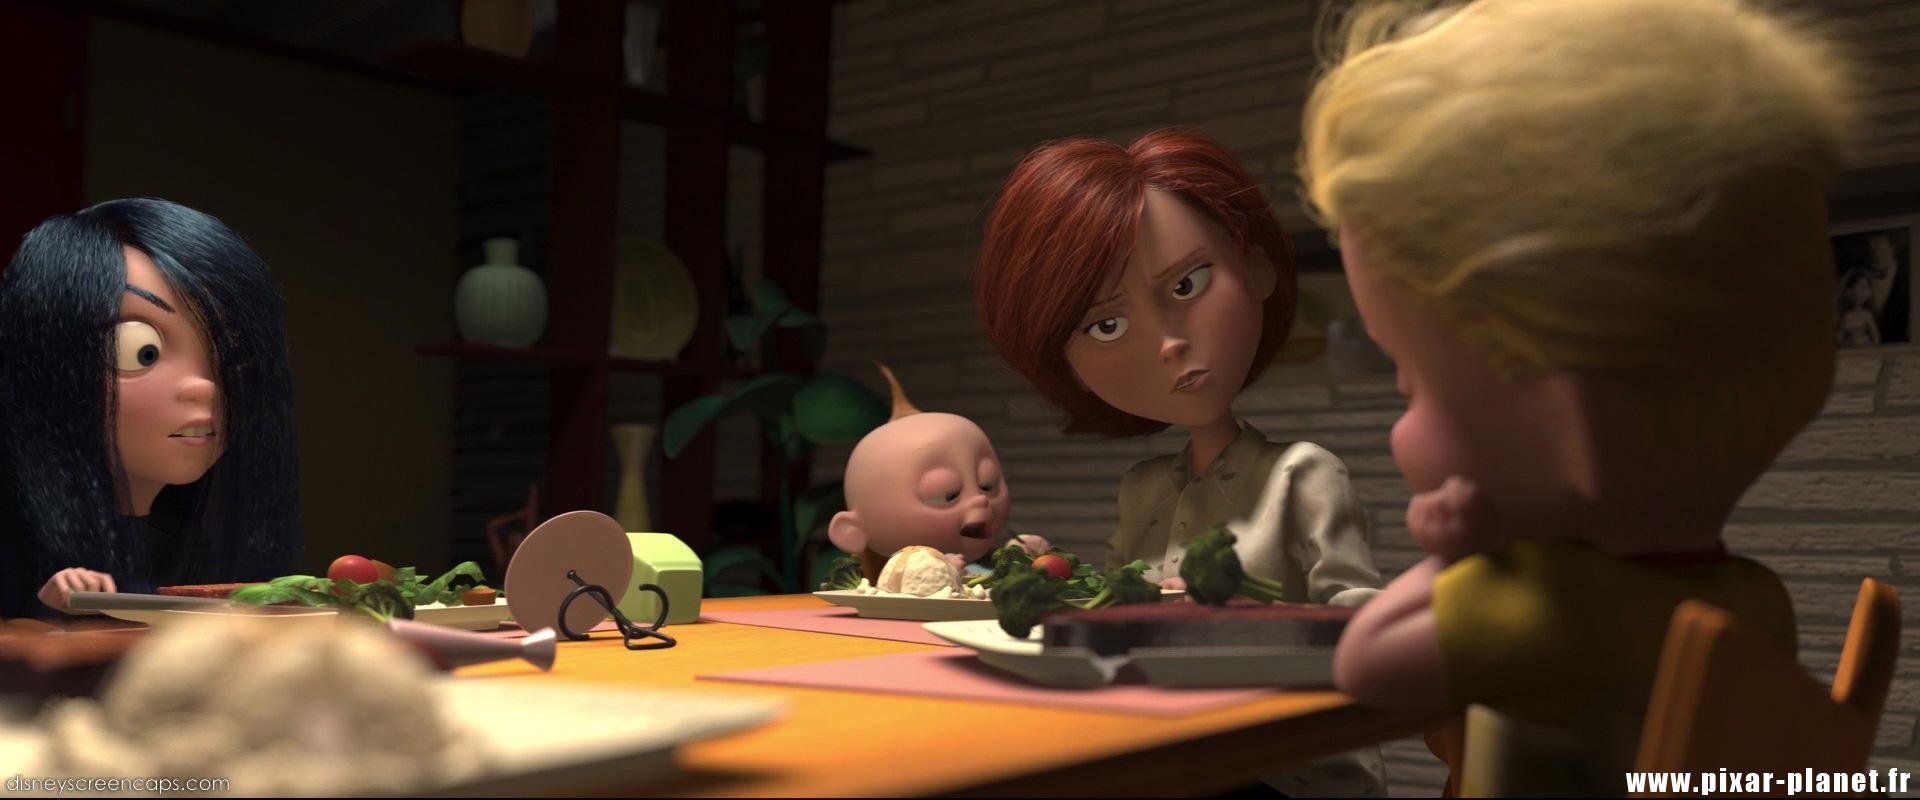 Pixar Planet Disney indestructibles incredibles